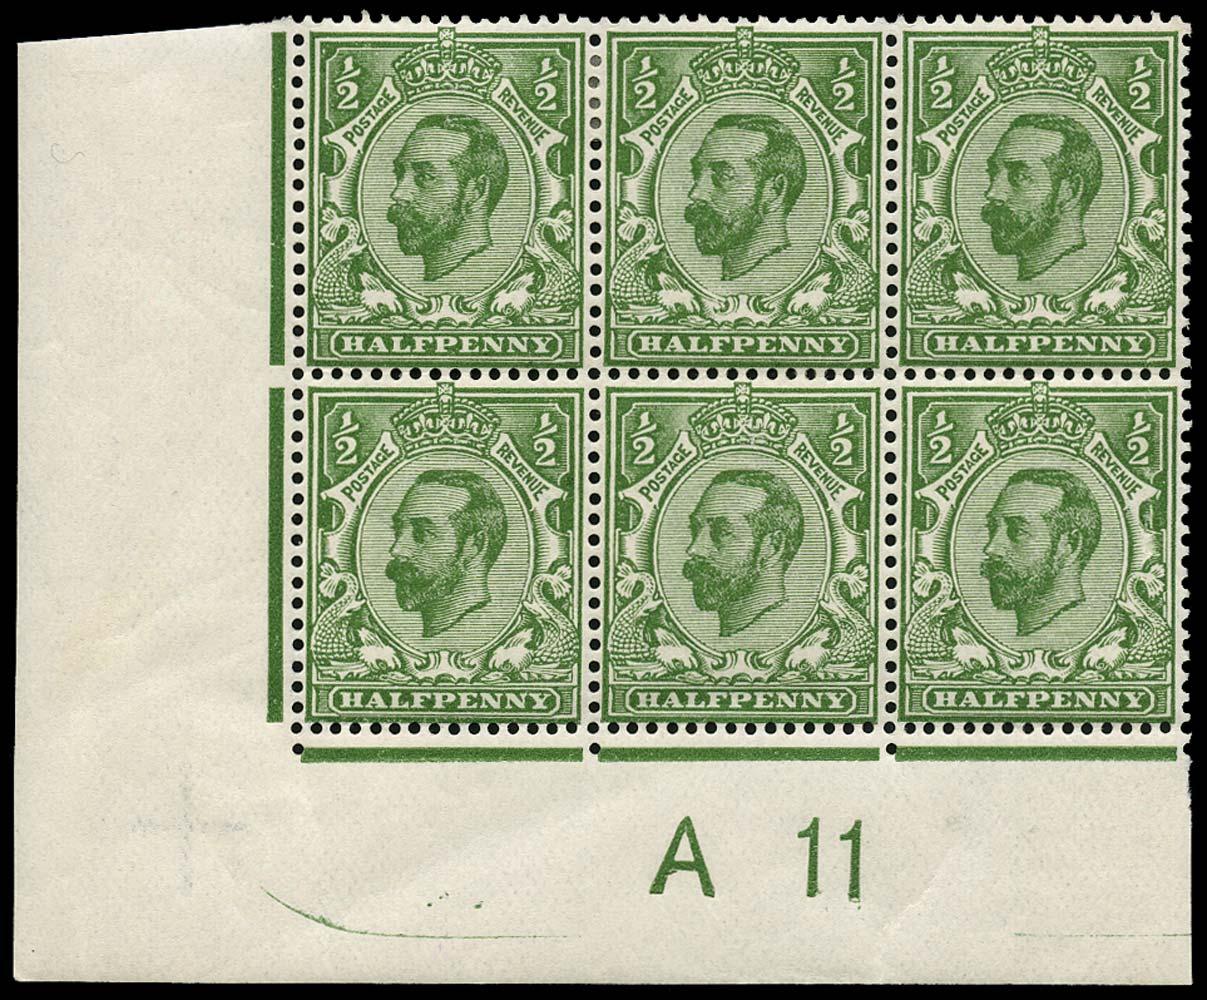 GB 1911  SG325var Mint A11 Control,